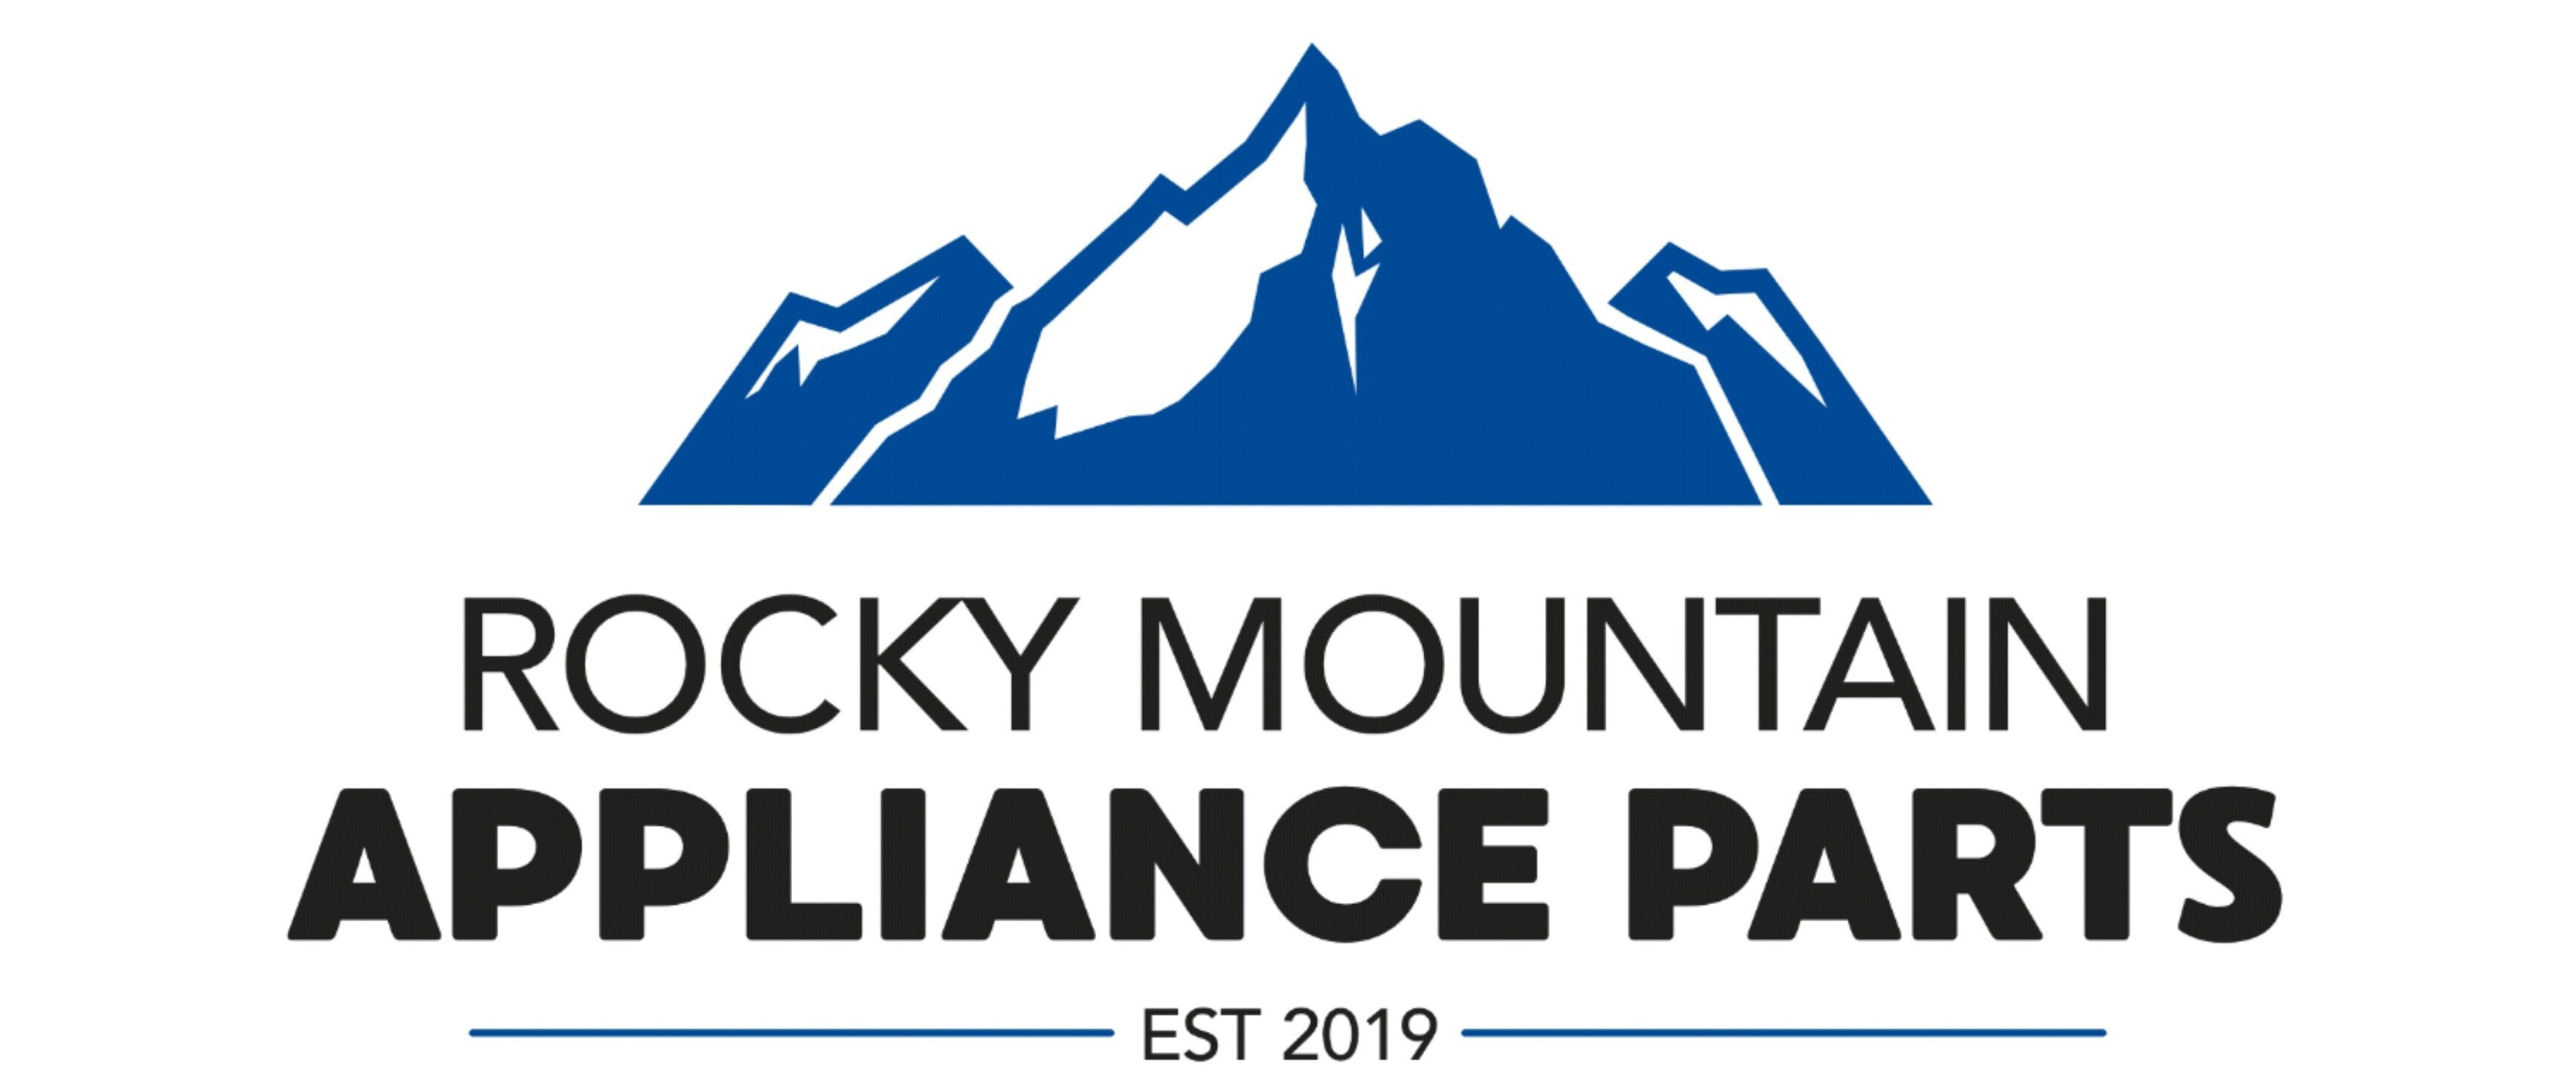 ROCKY MOUNTAIN APPLIANCE PARTS LLC